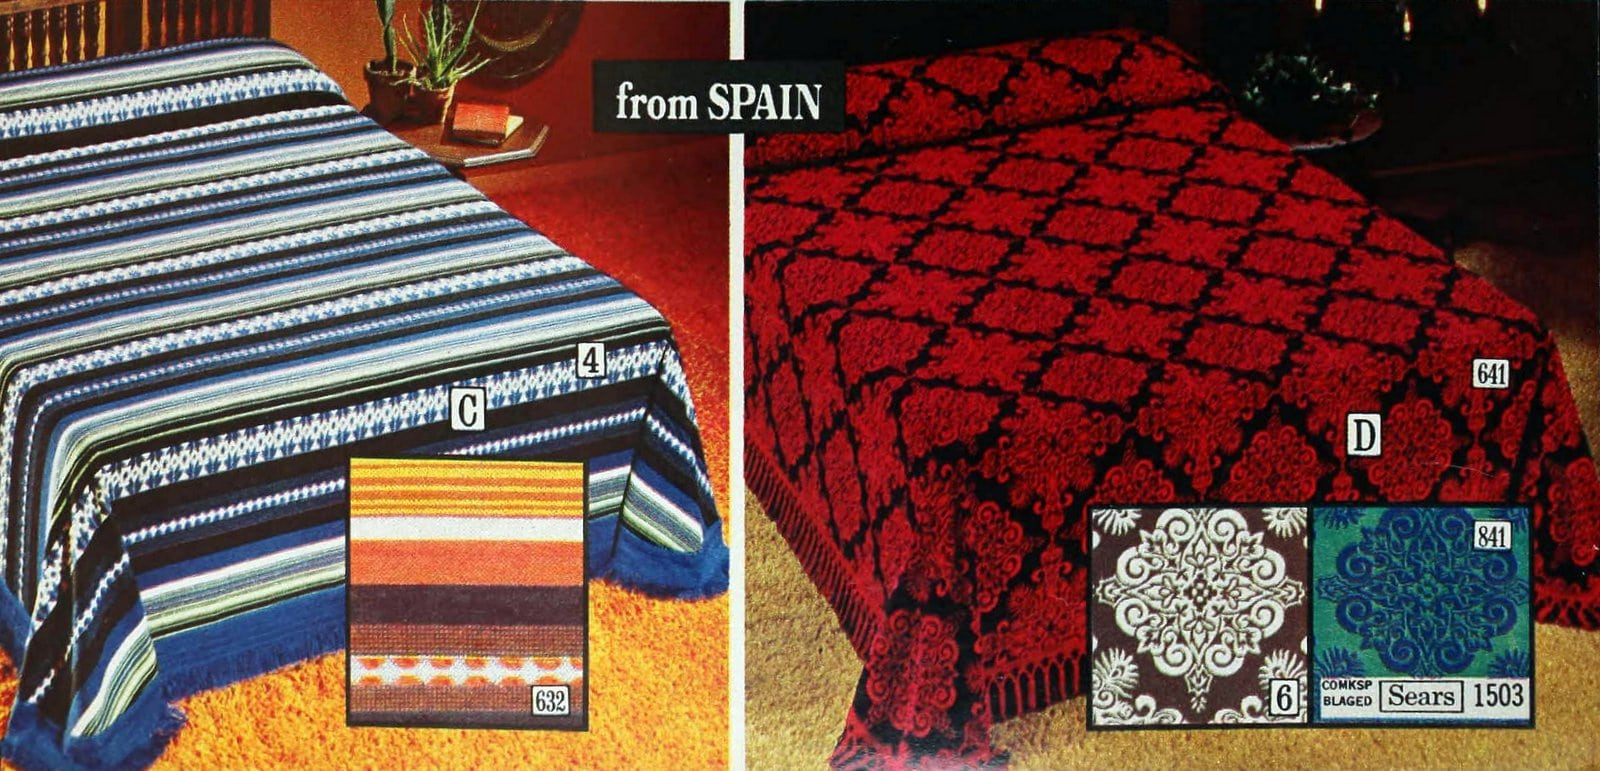 Dorado and Alicante retro 70s bedspreads inspired by Spain